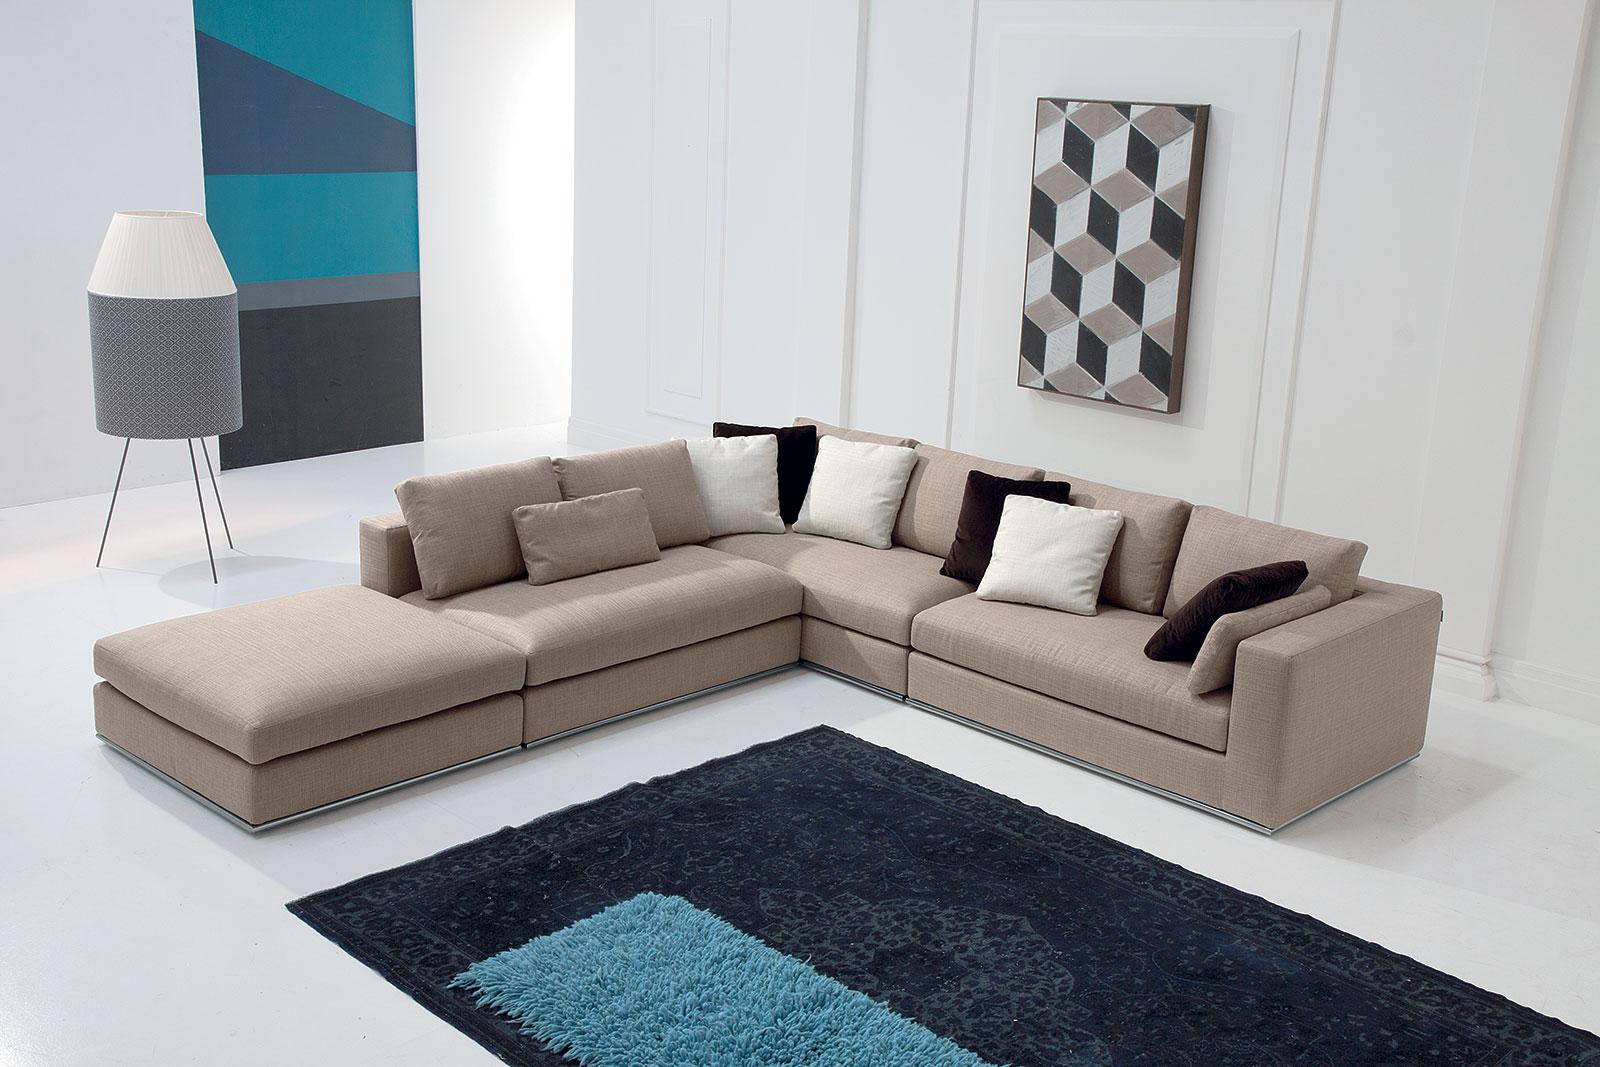 Divani moderni strani salisburgo divani moderni mobili for Arredamenti per salotti moderni